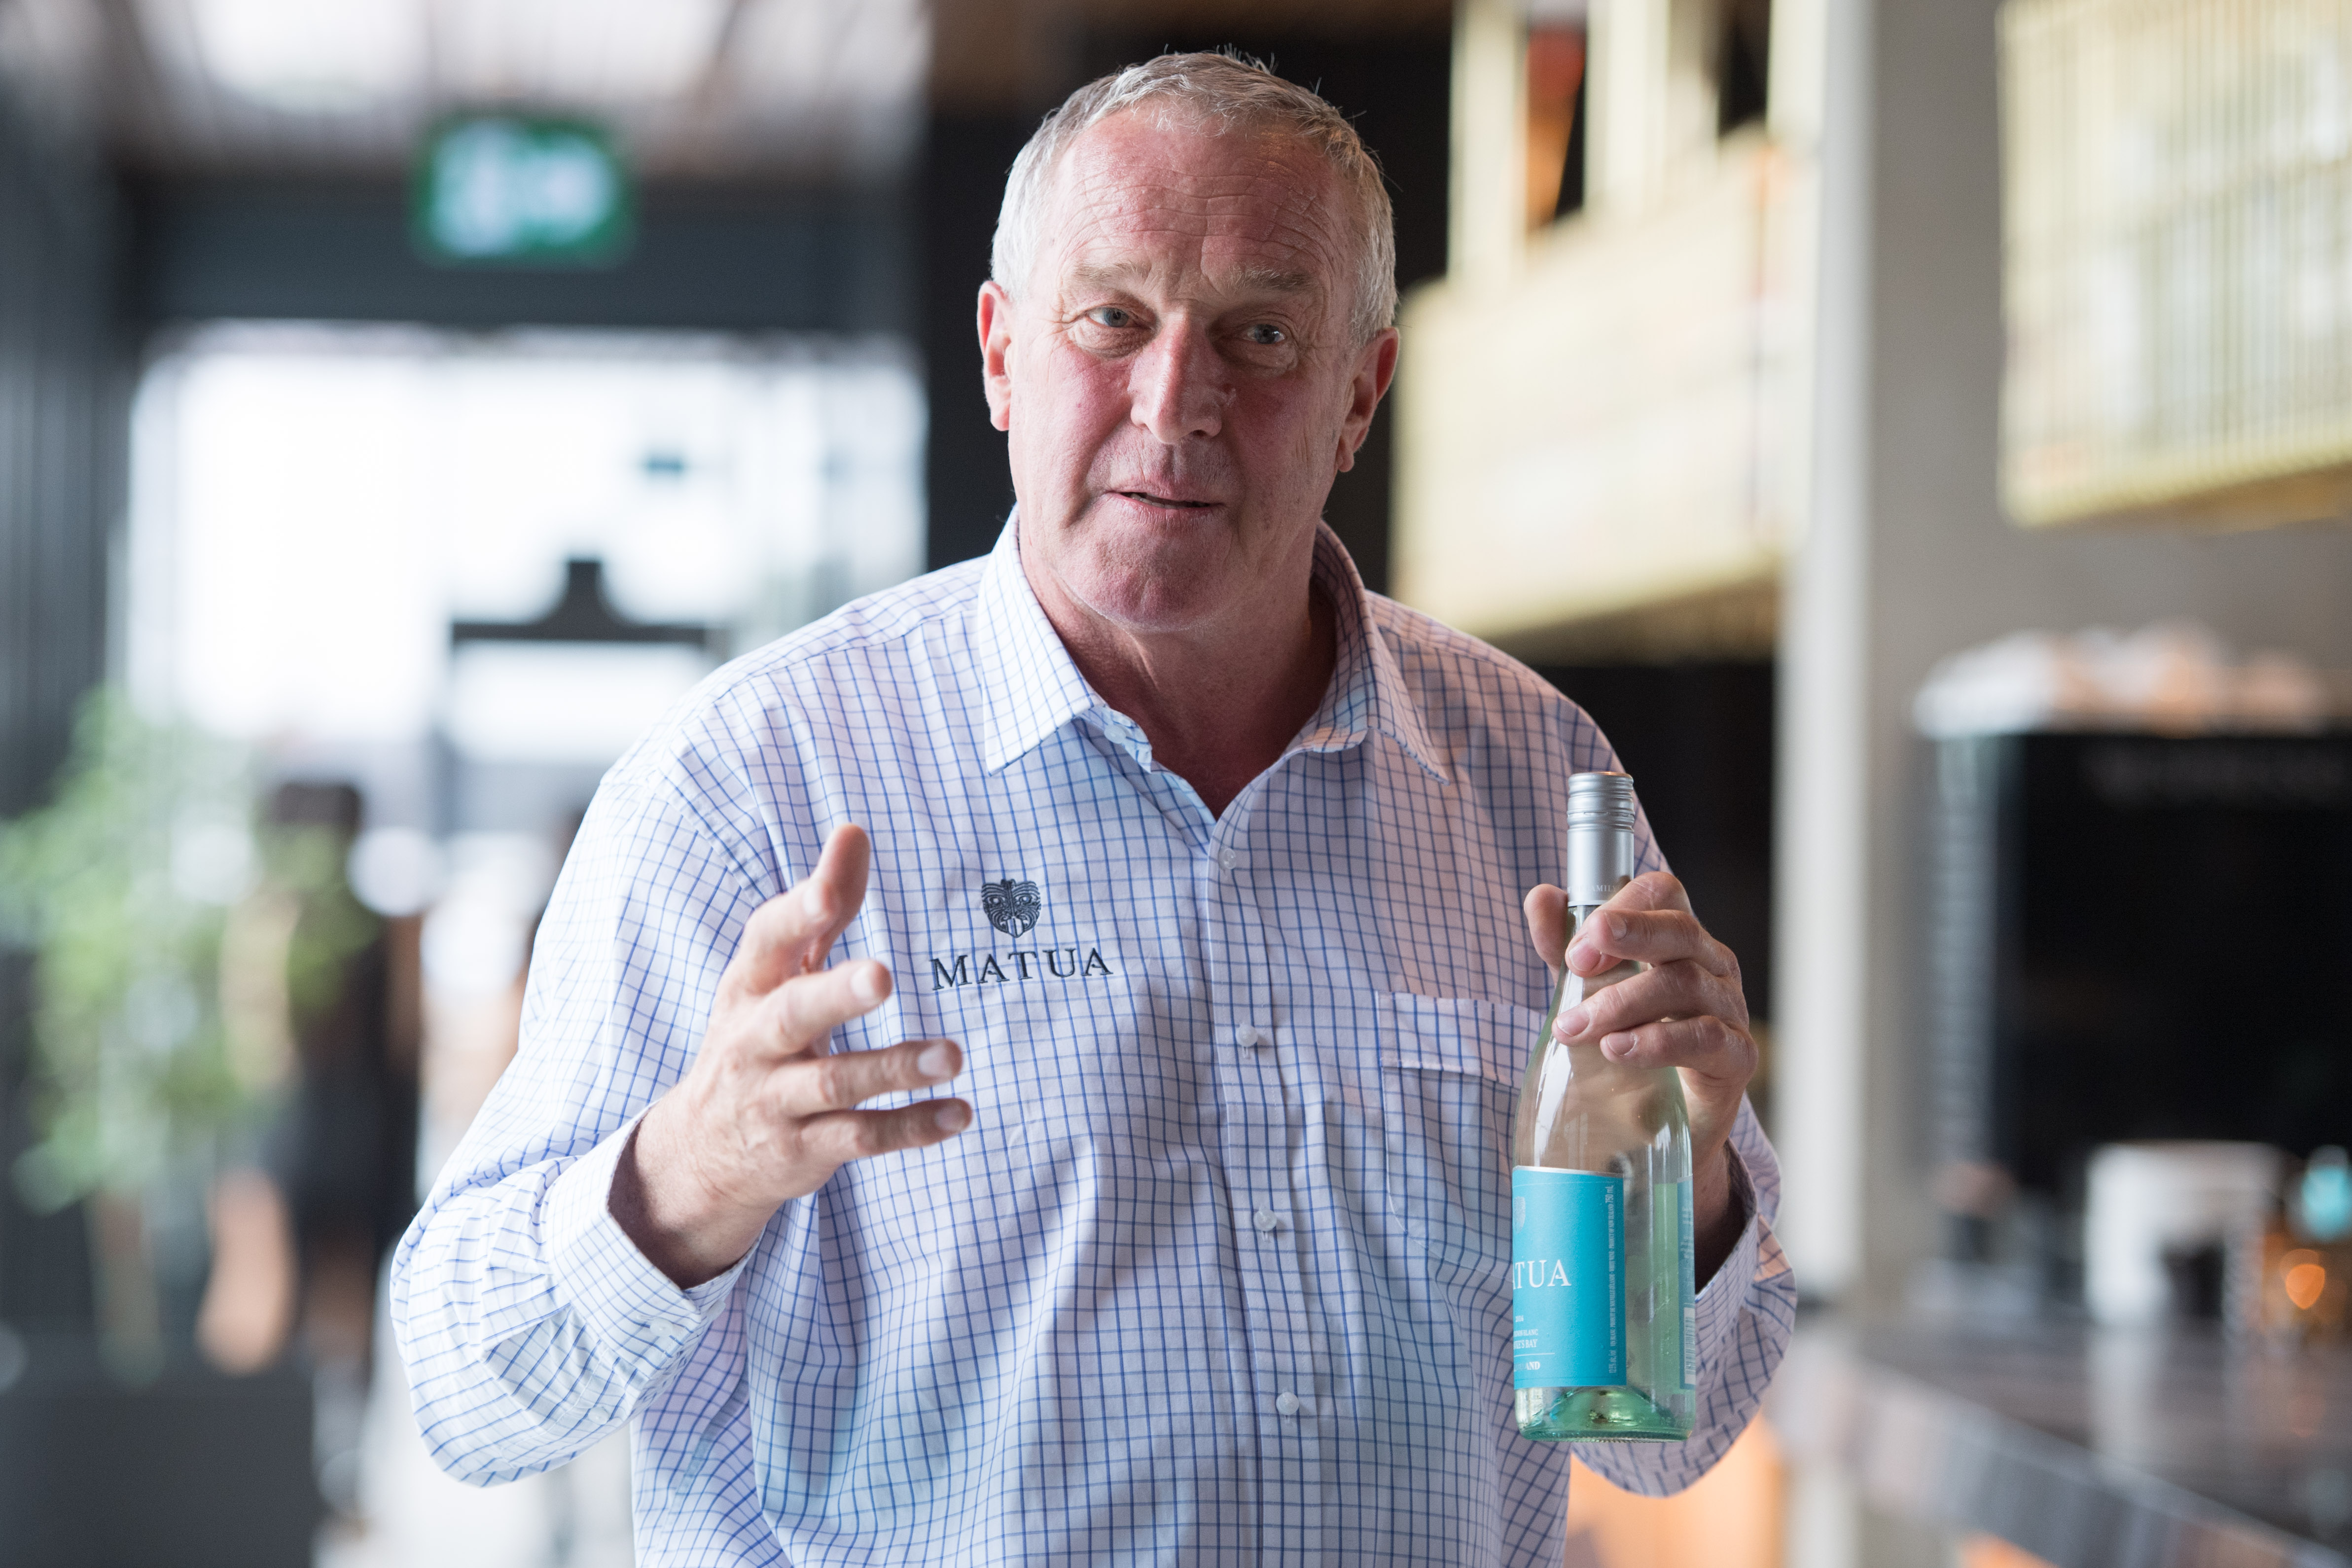 Co-founder Bill Spence